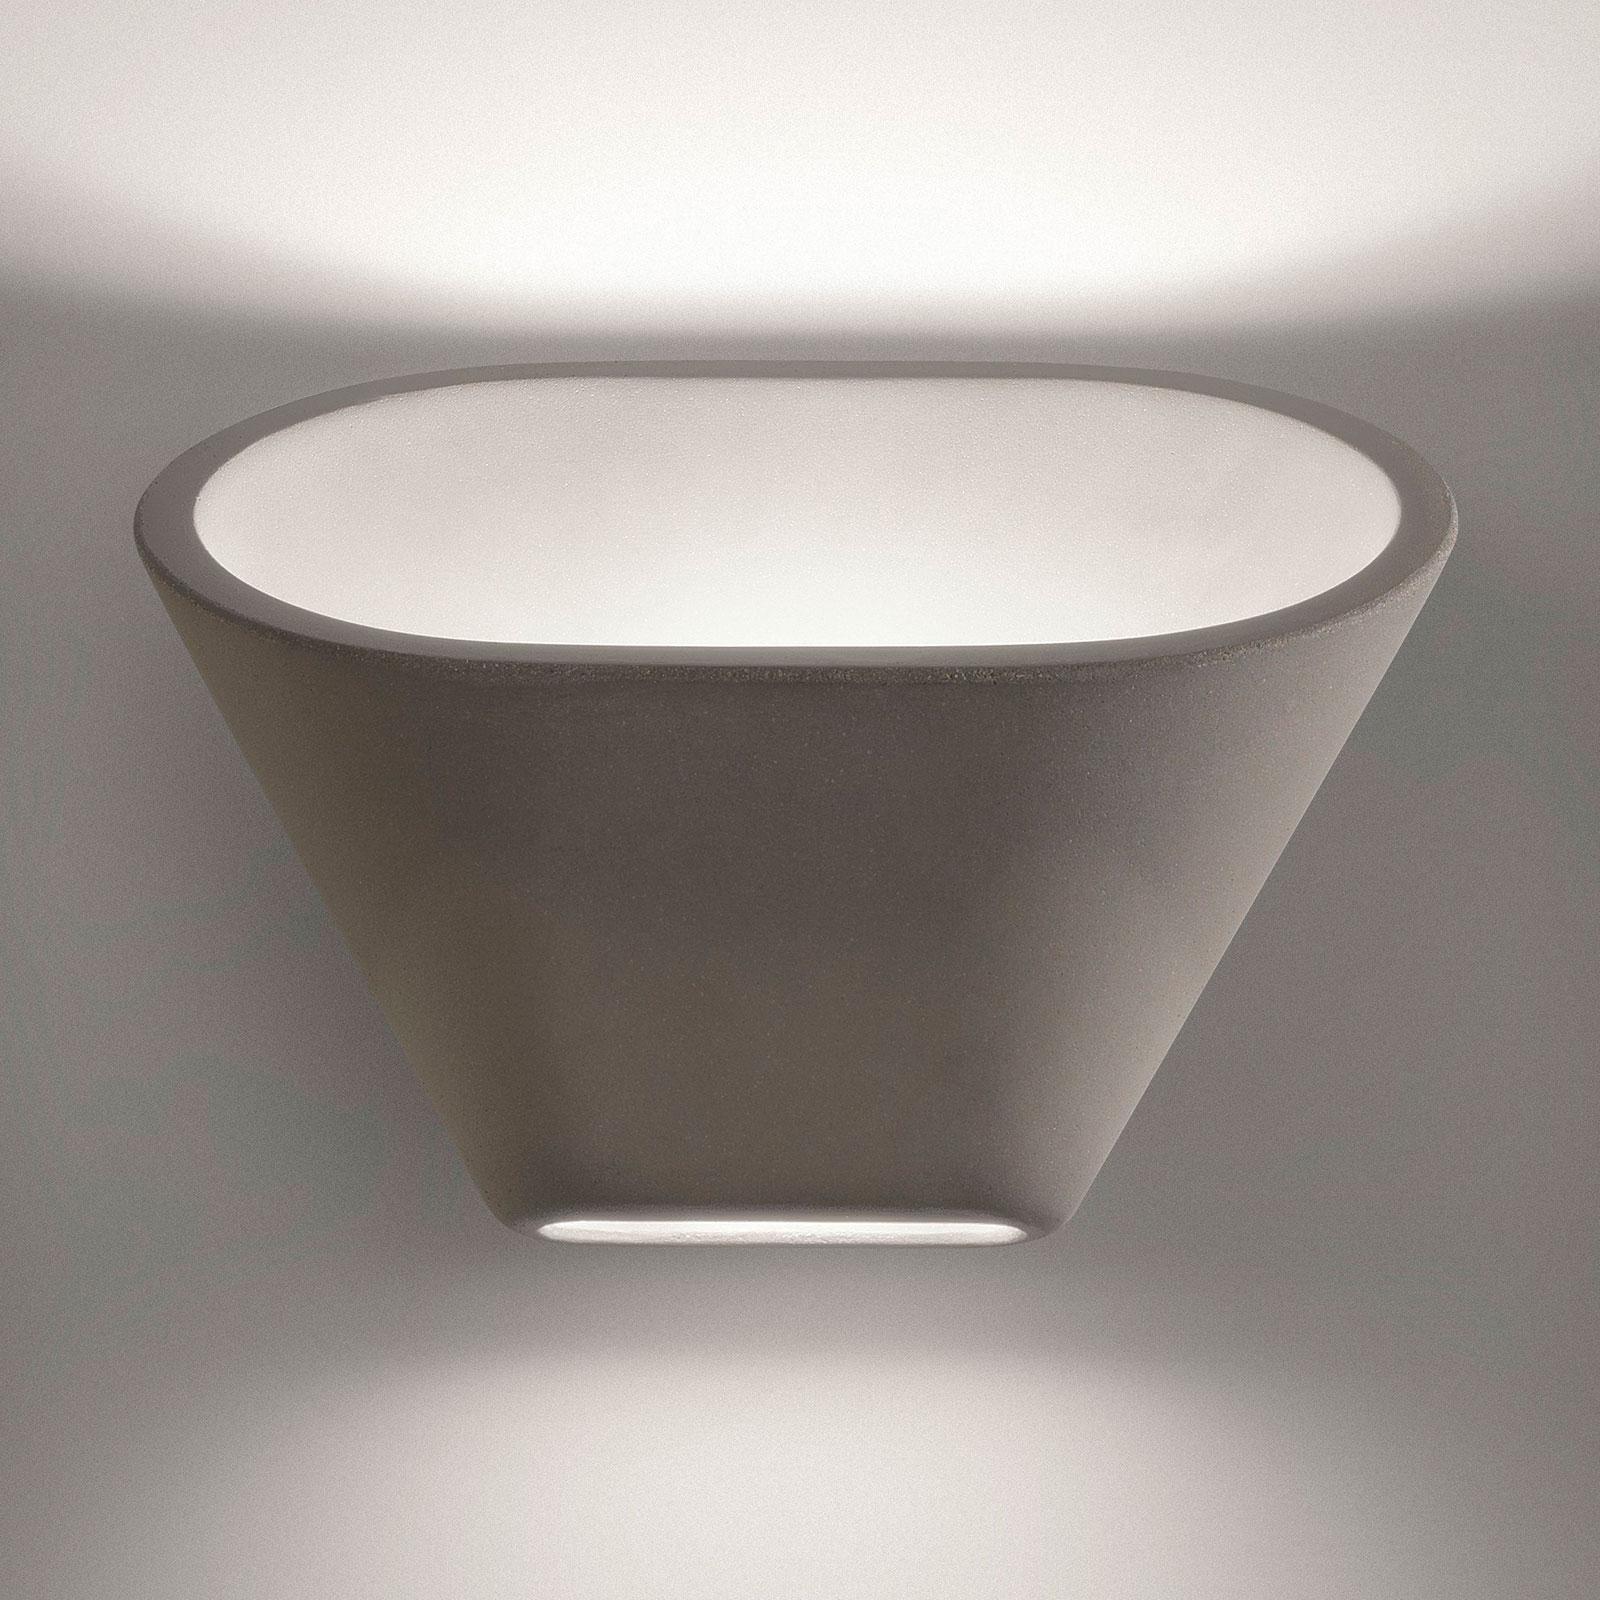 Foscarini Aplomb lampa ścienna LED, szara